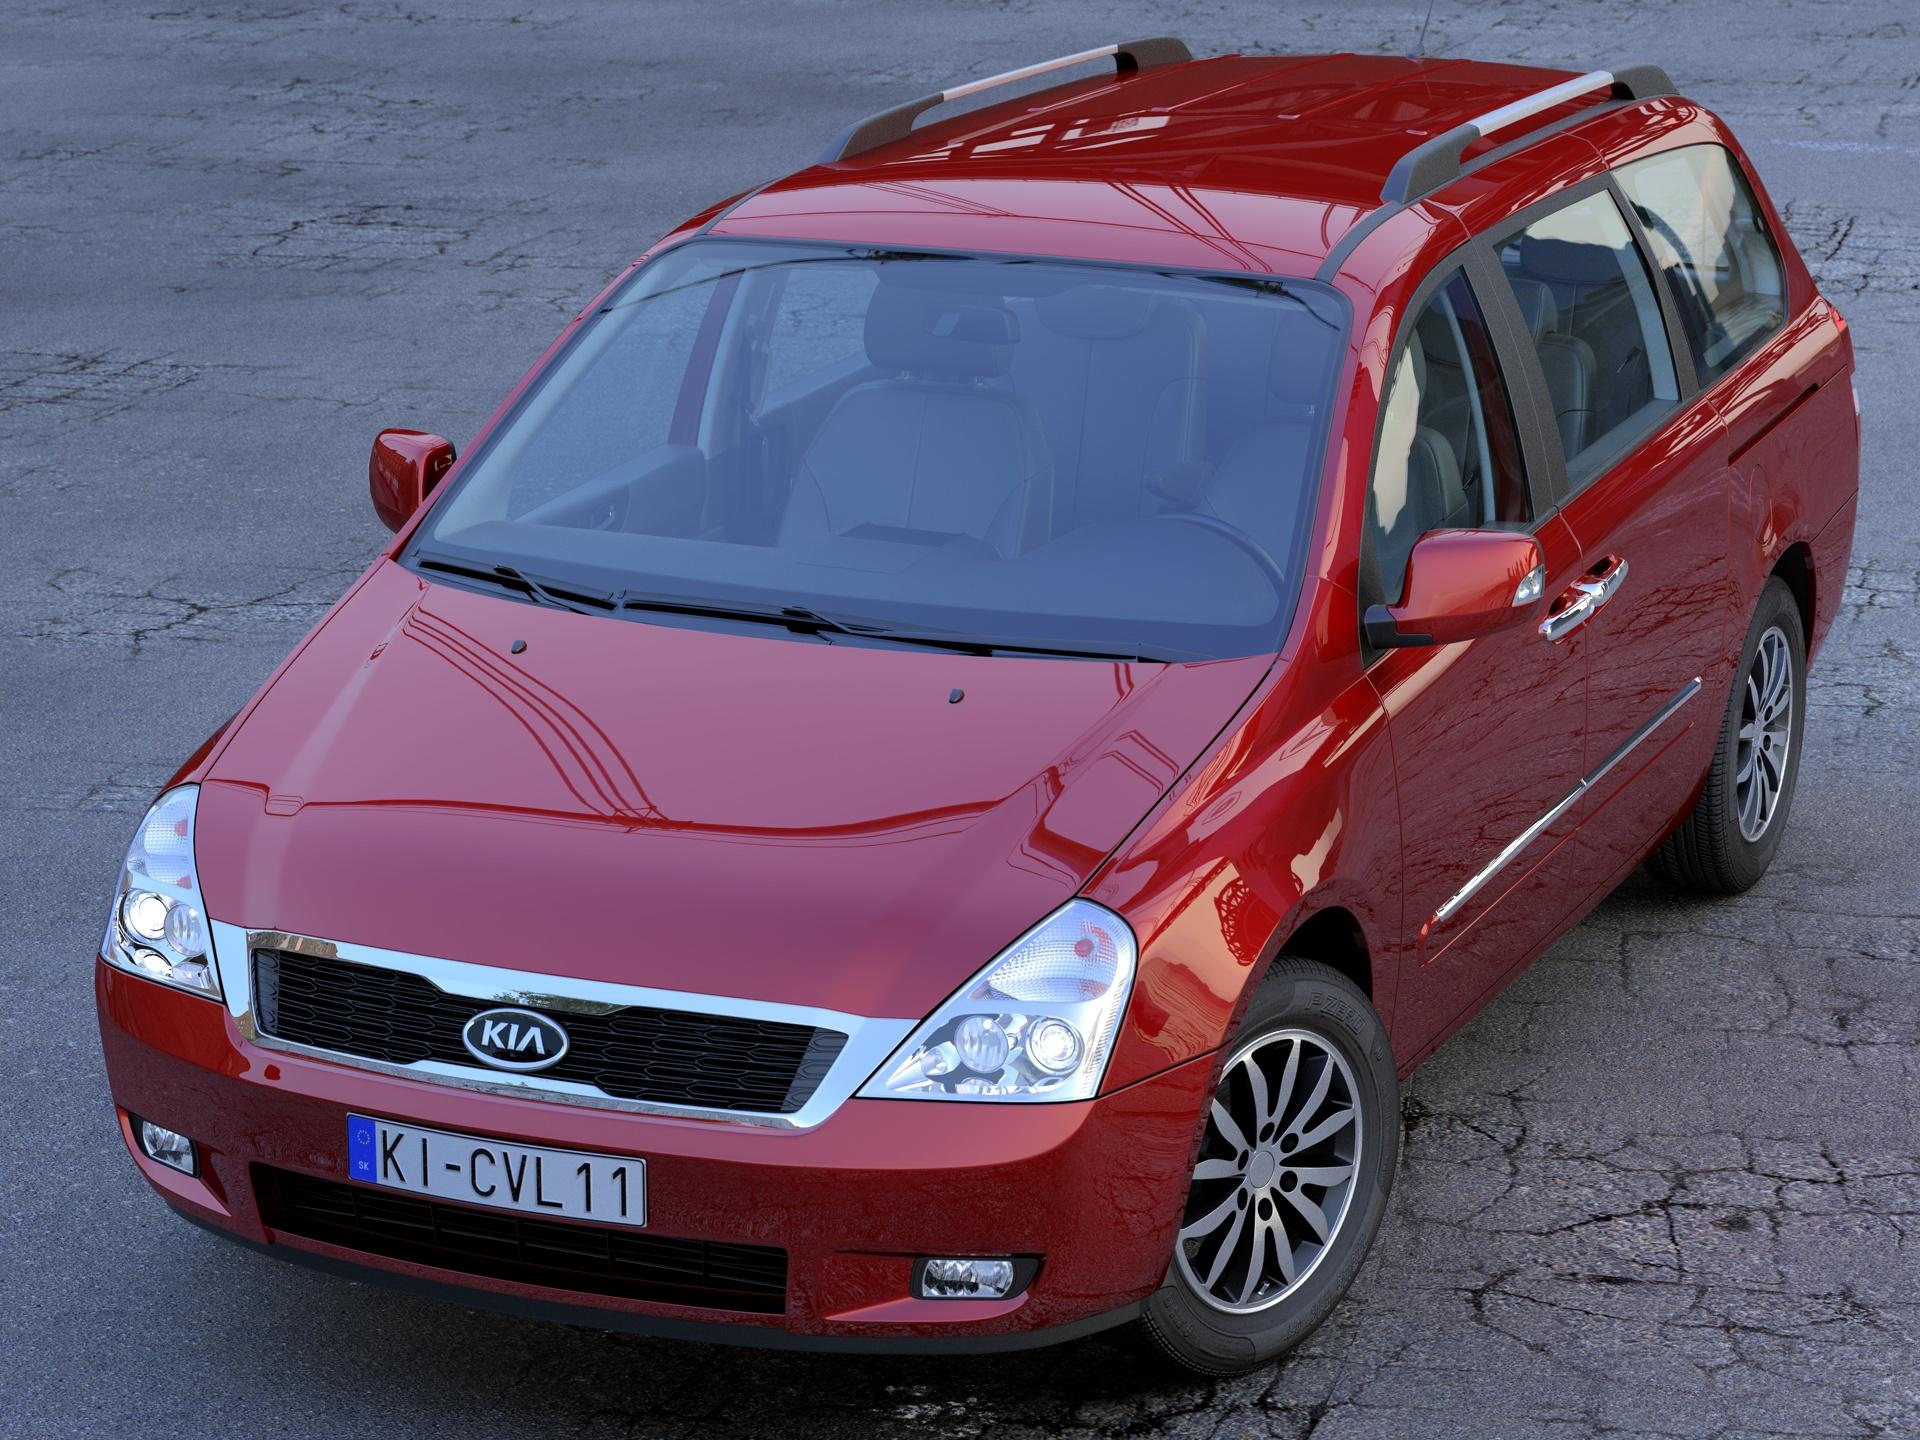 kia carnival 2011 3d model 3ds max fbx c4d obj 212935